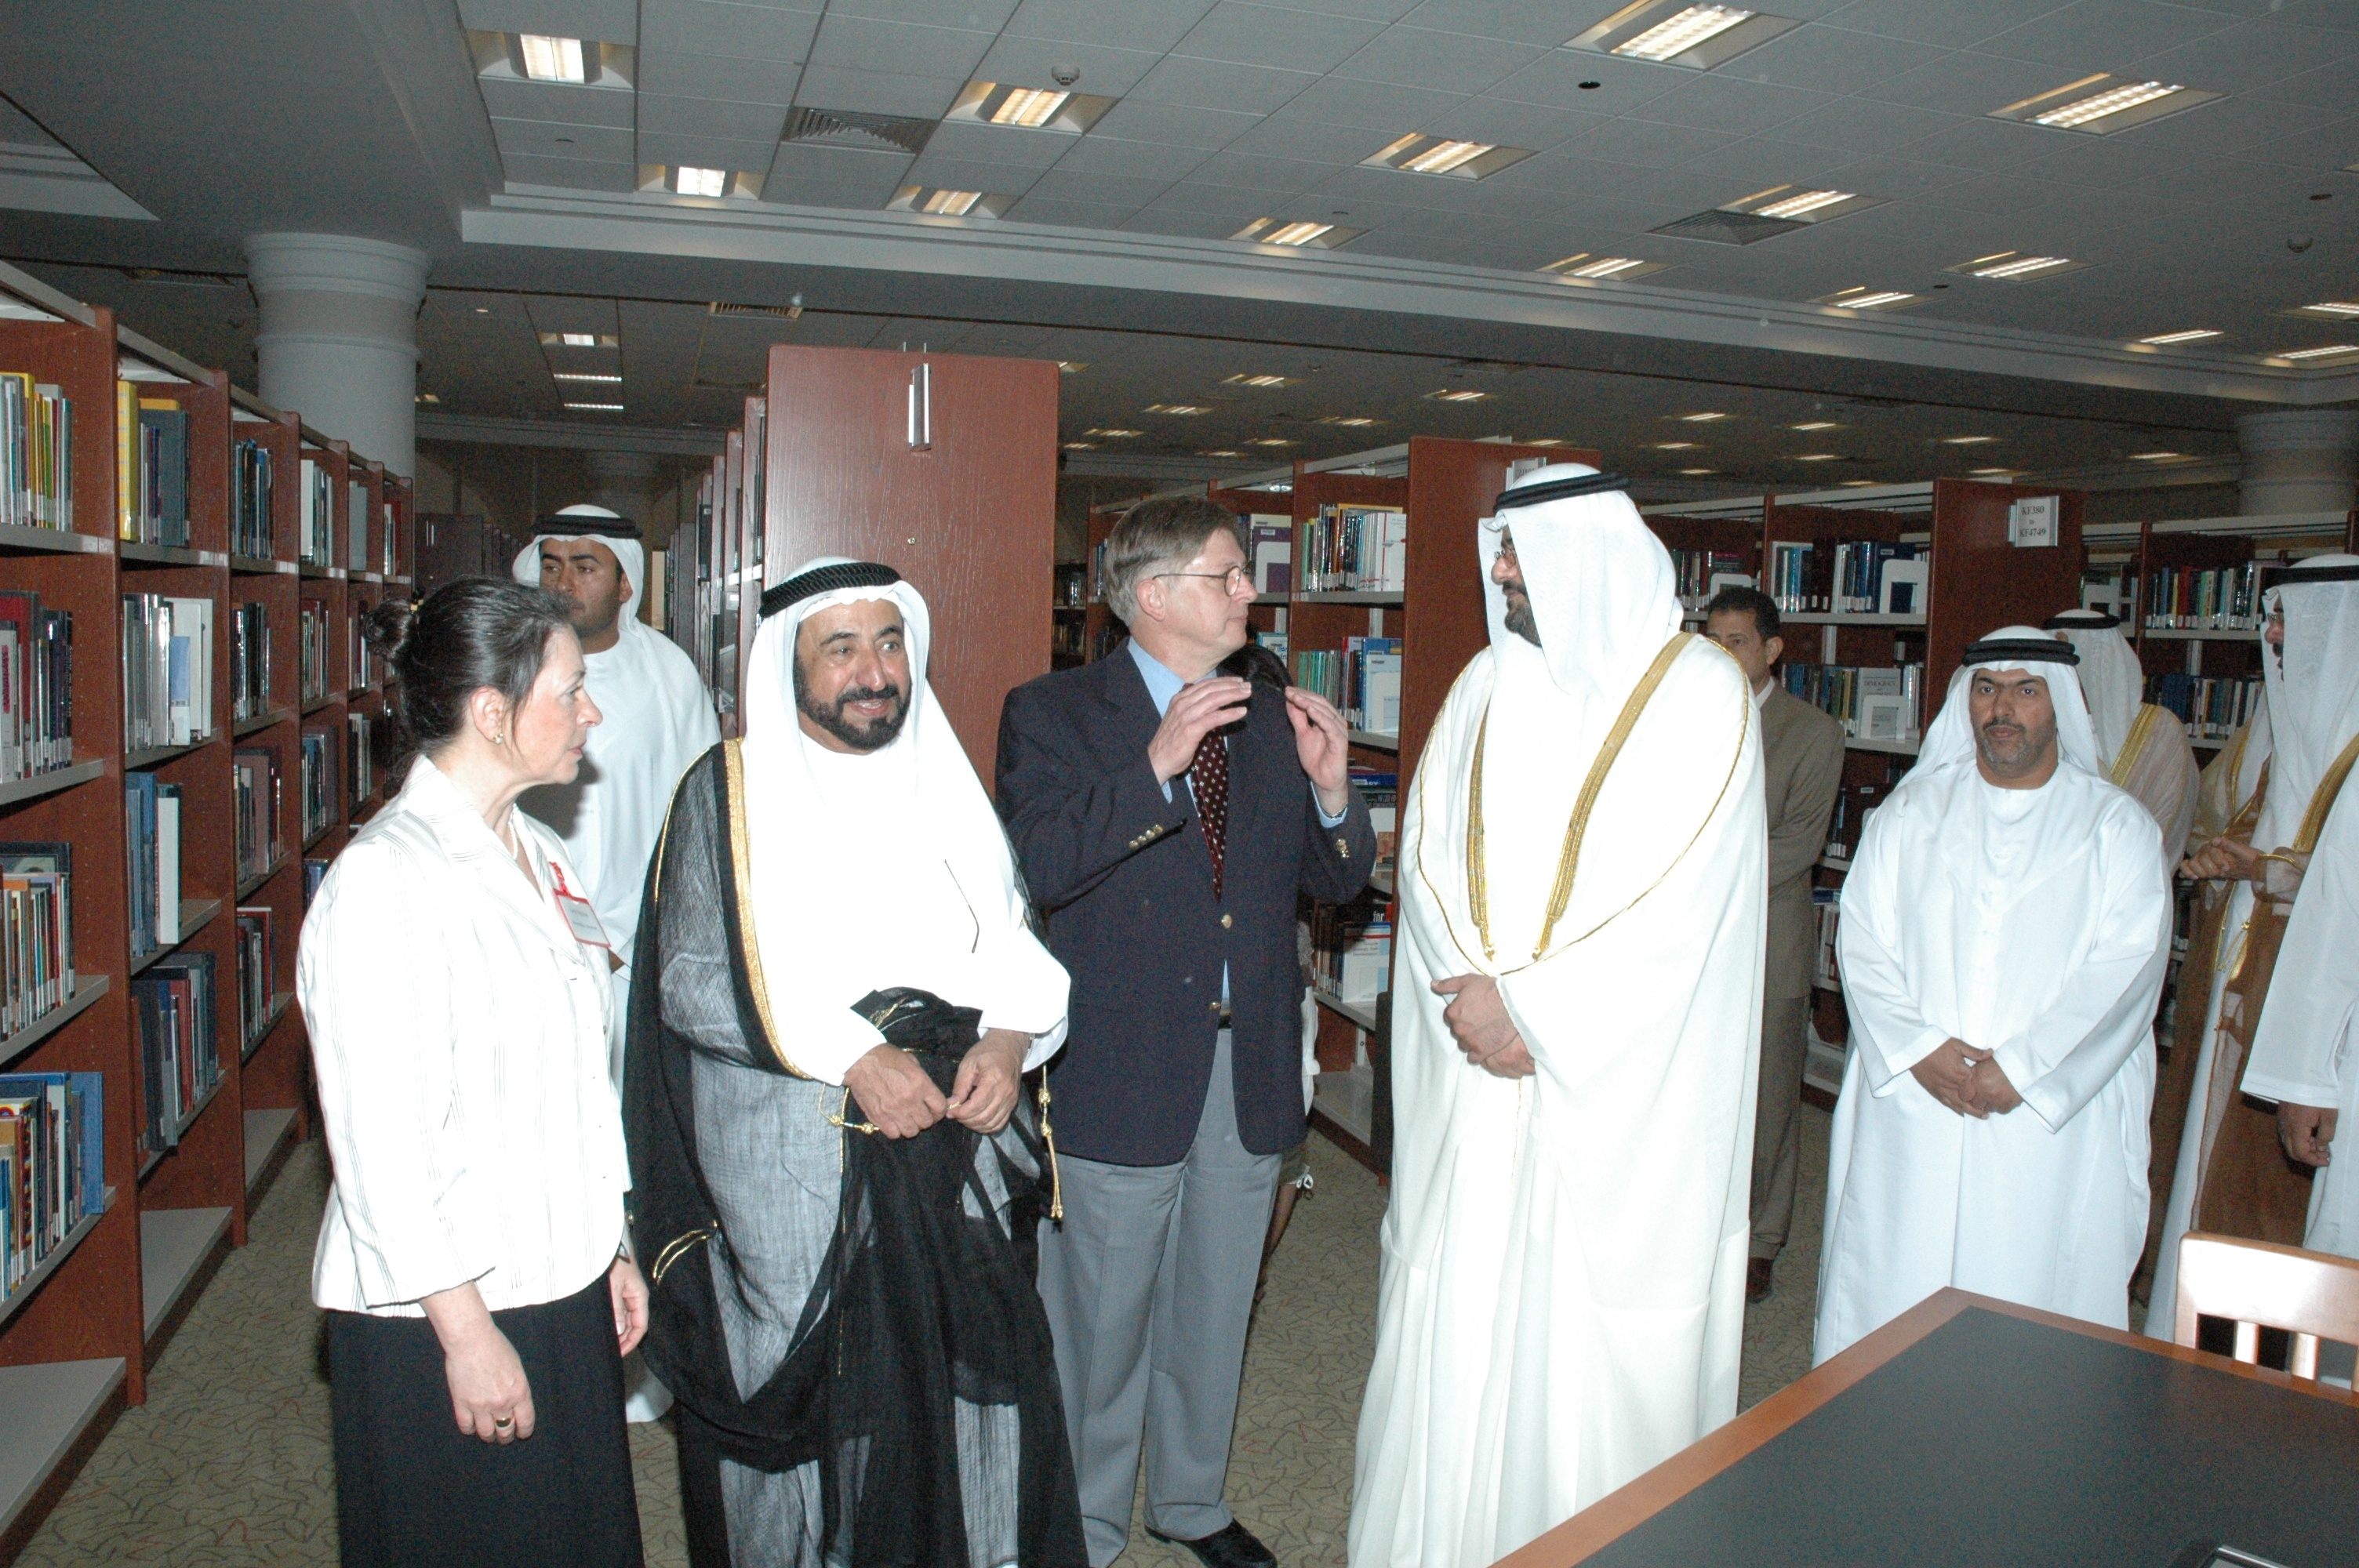 American_University_of_Sharjah_Library_6.jpg